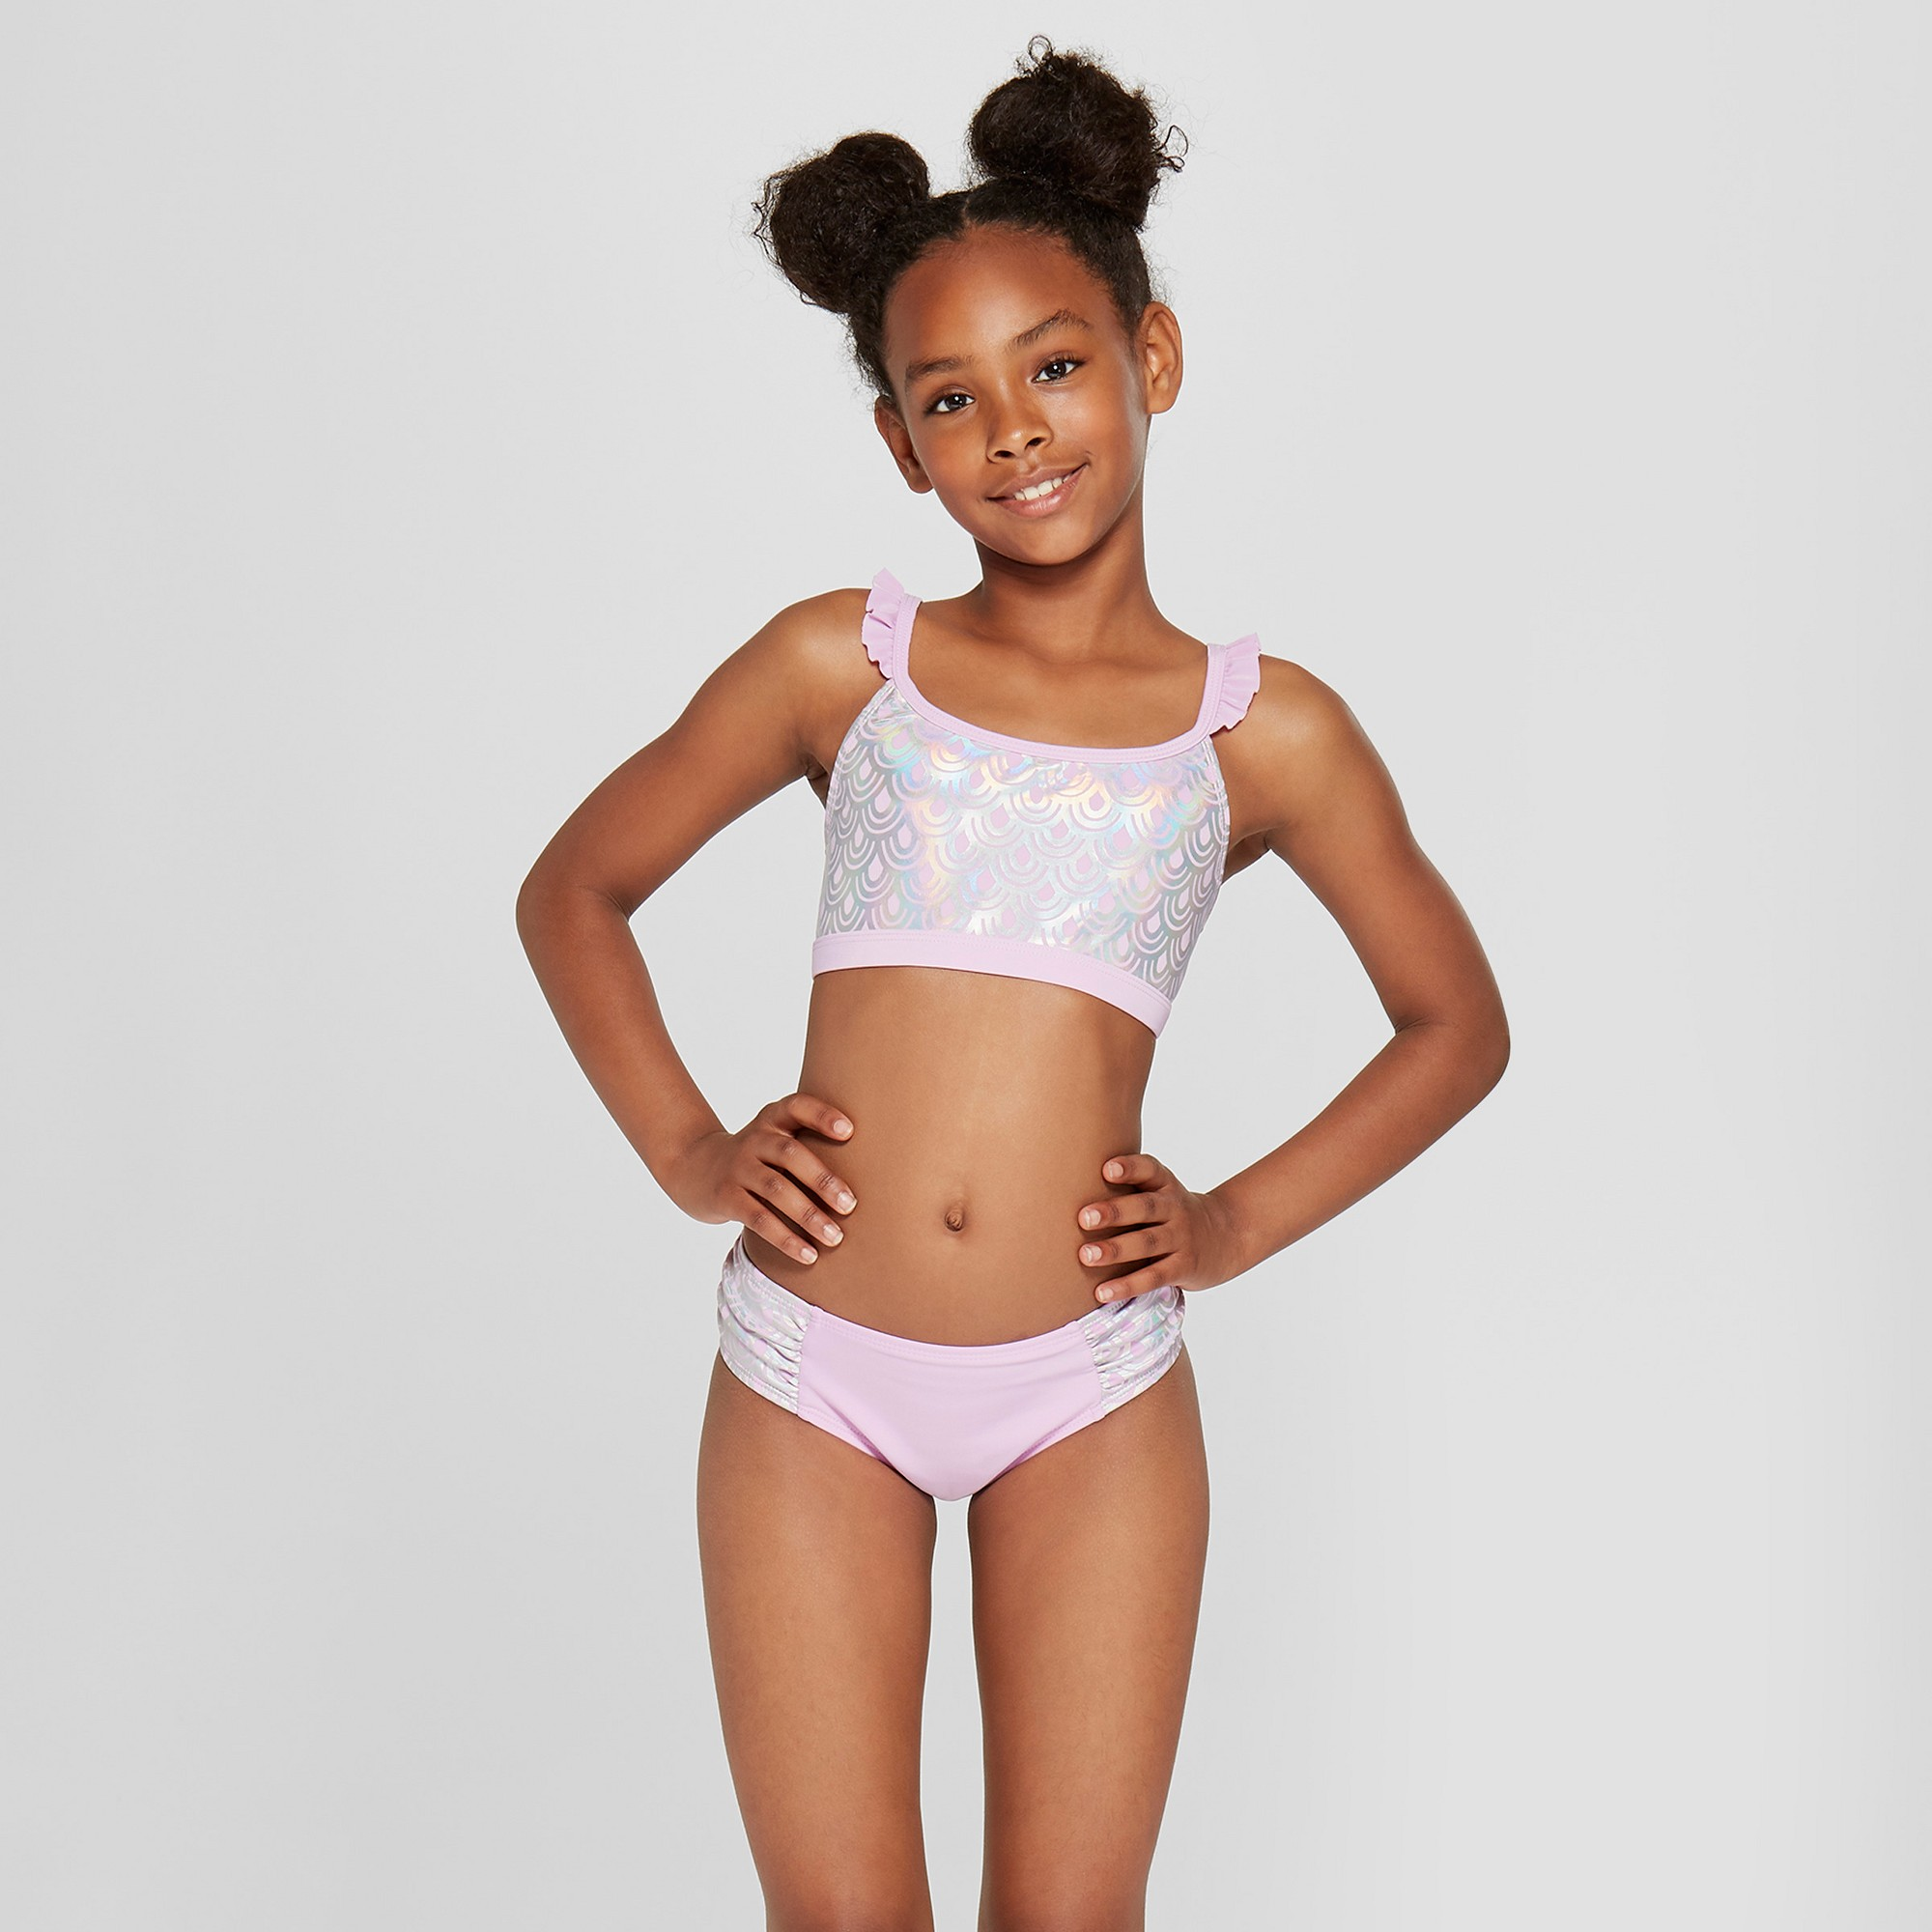 Young little girls bikini models